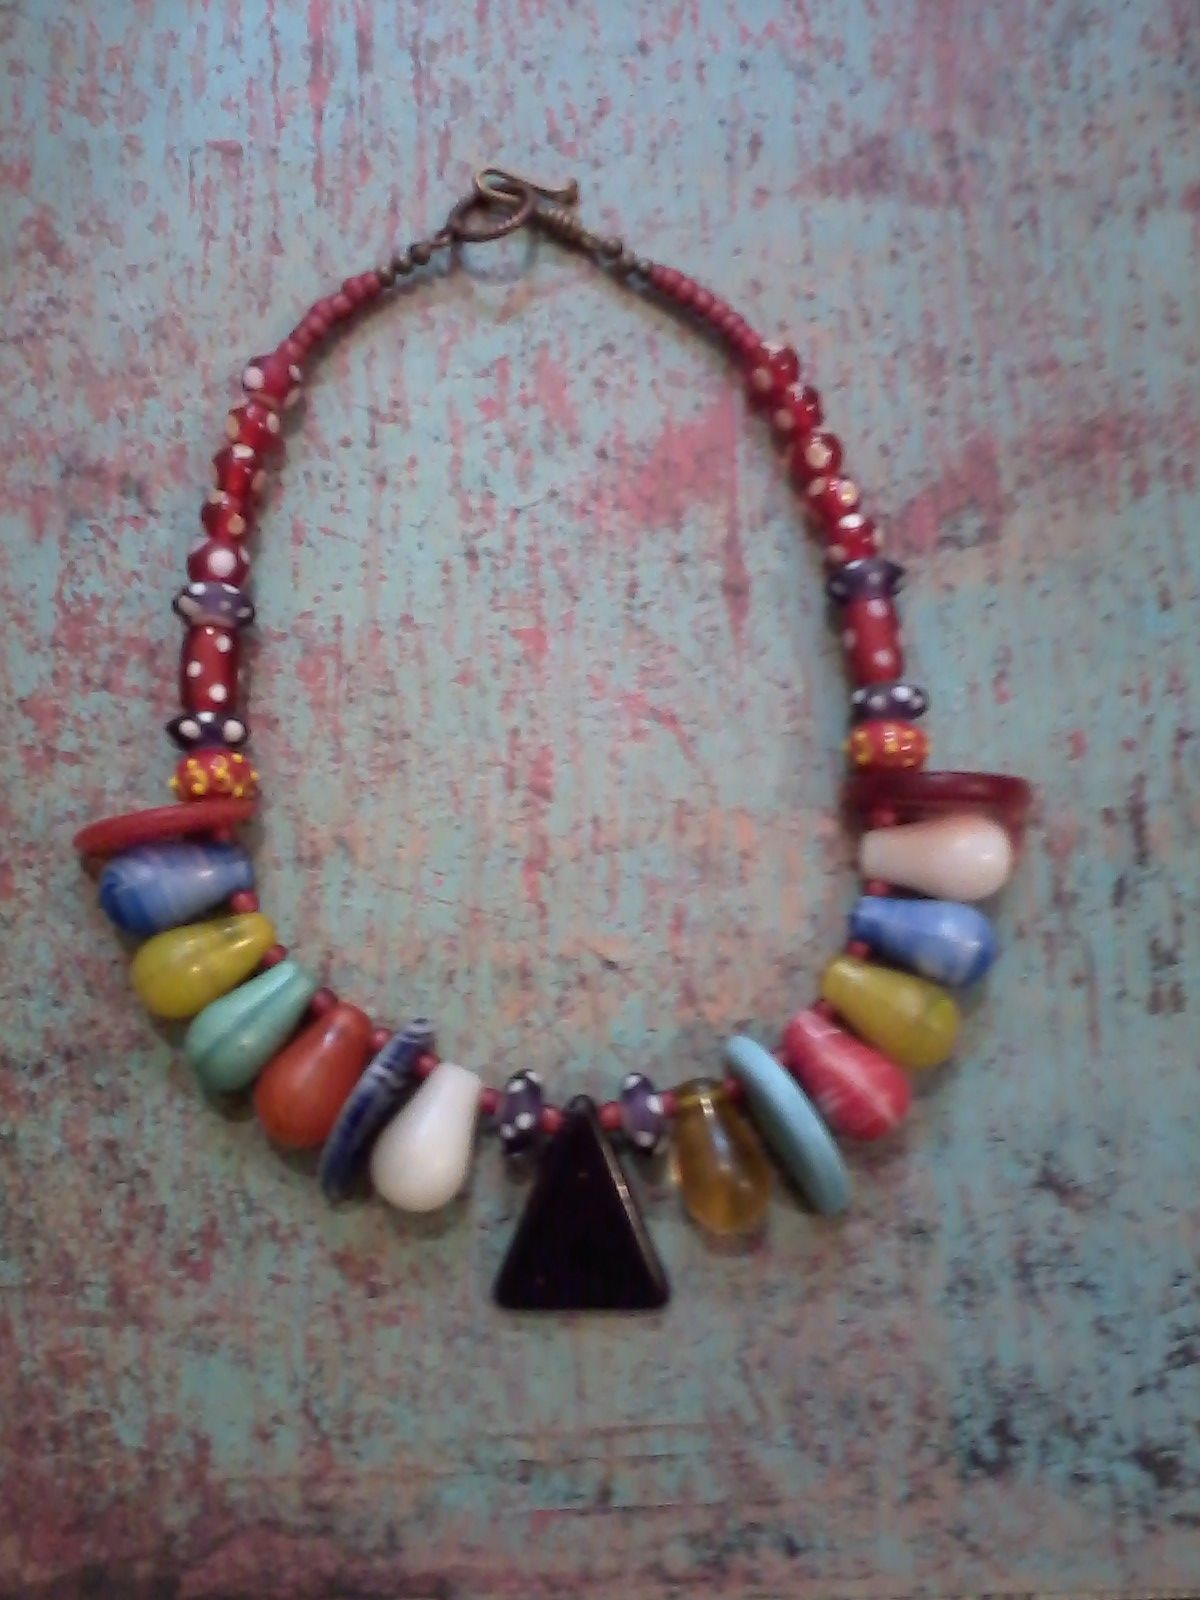 Mali wedding beads and contemporary lamp work beads.